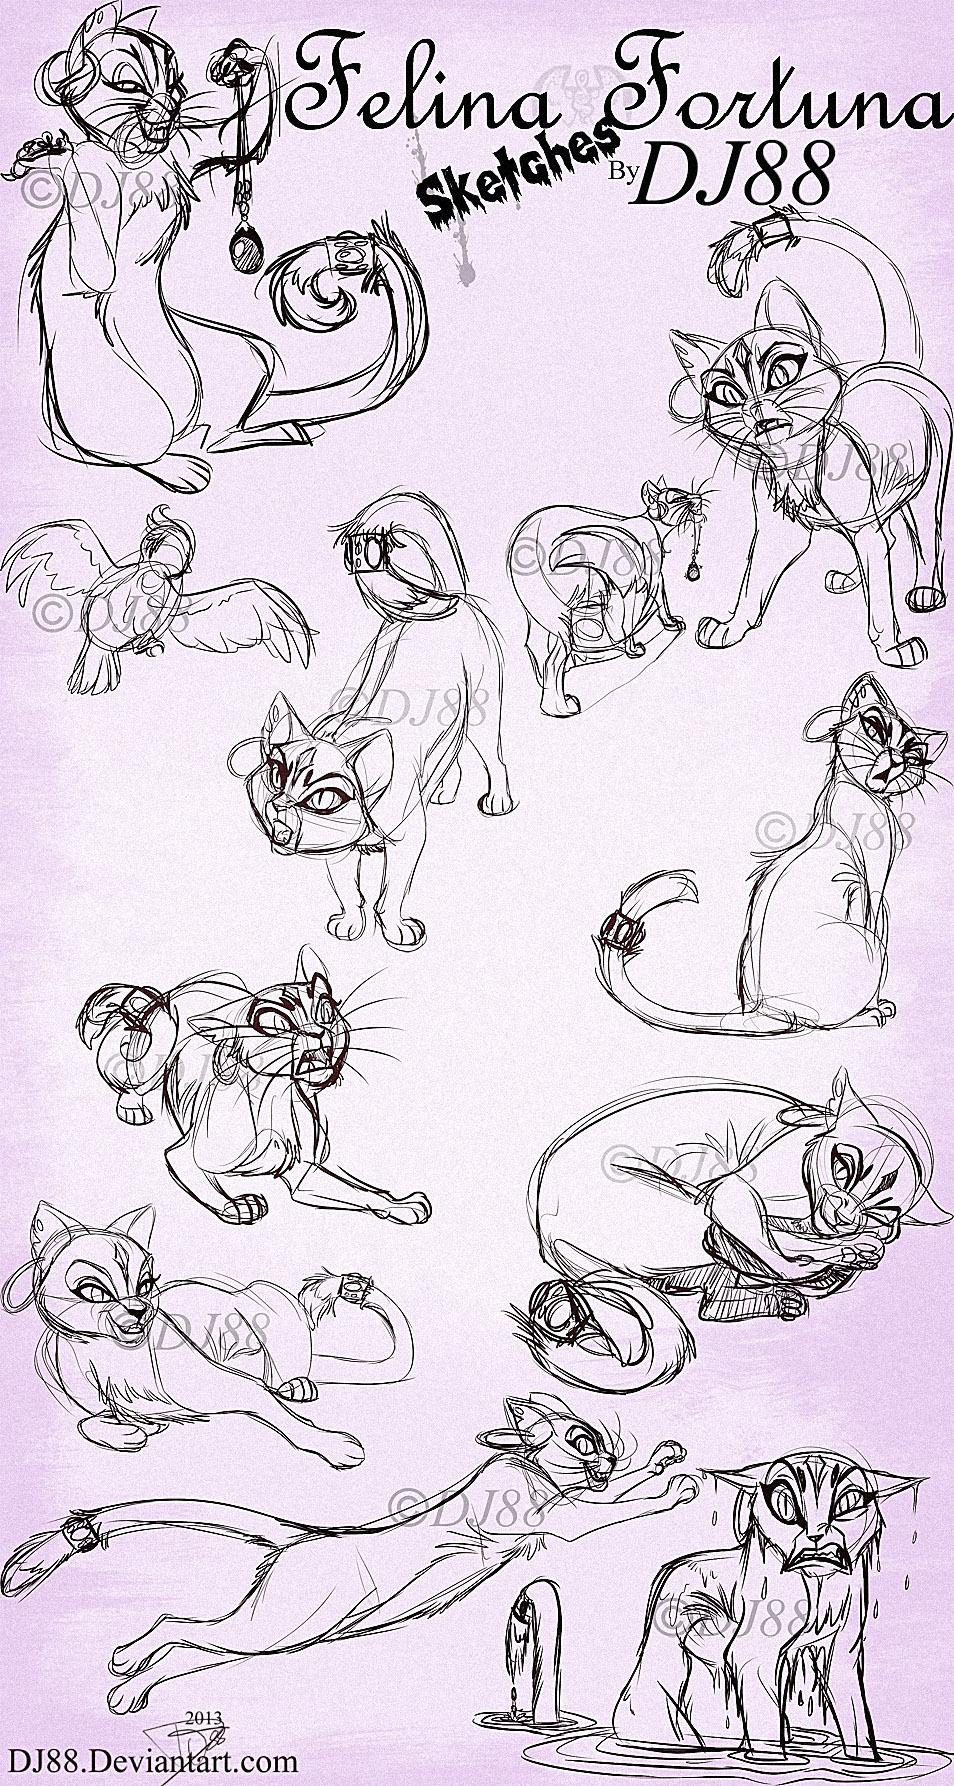 Felina Fortuna Live Stream Sketches by DJ88